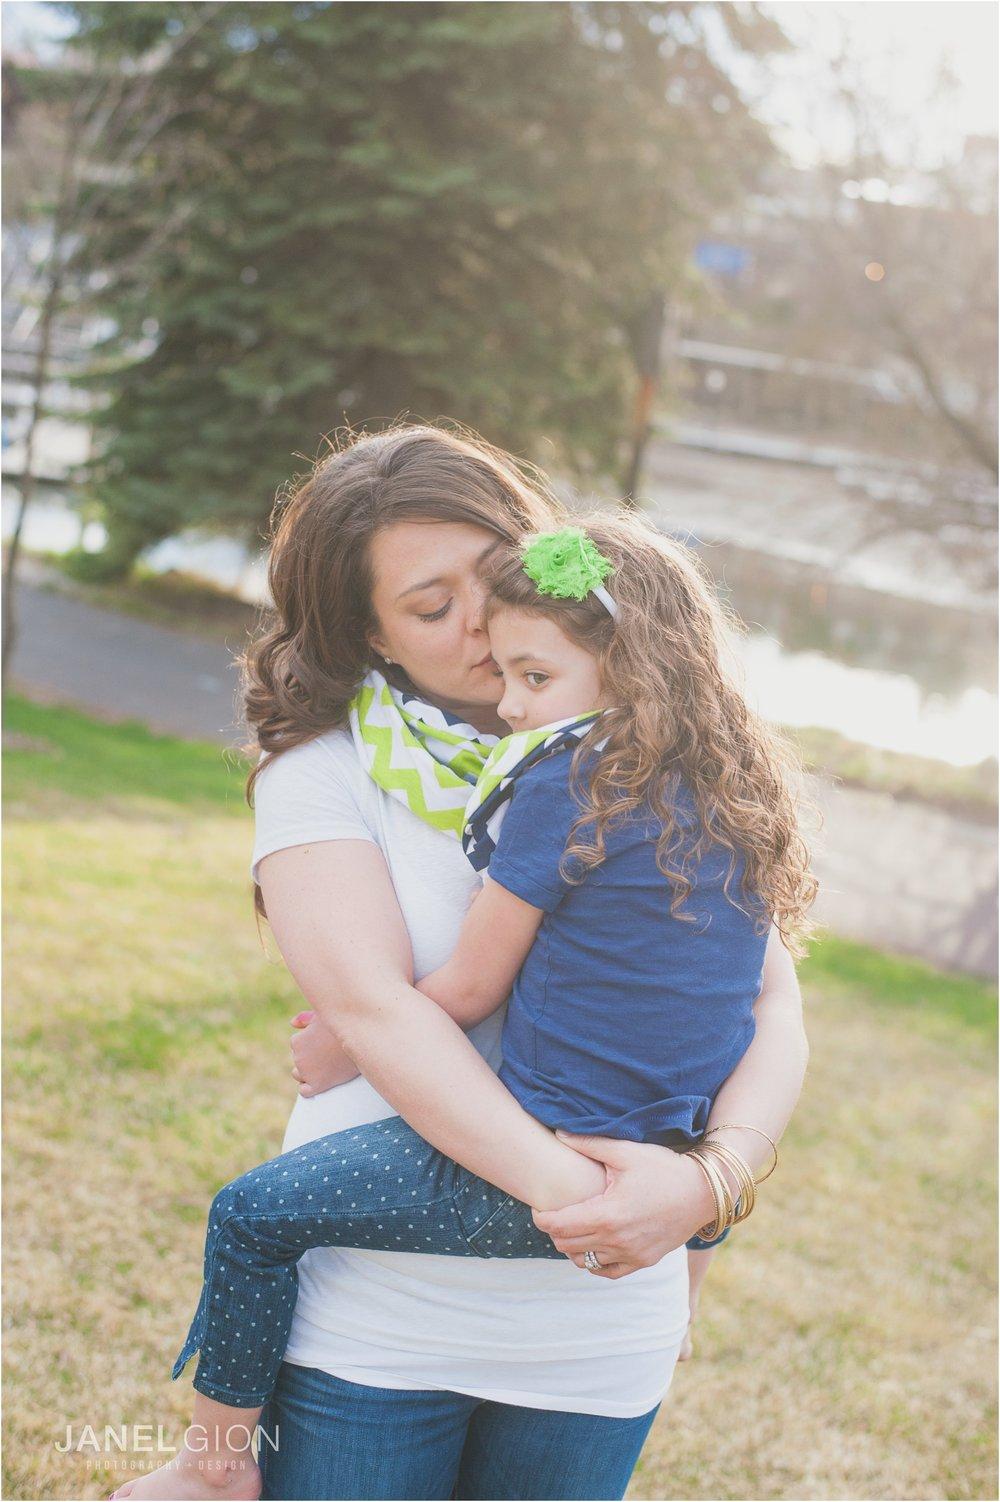 Janel-Gion-Sandpoint-Idaho-Portrait-Family-Photographer_0018